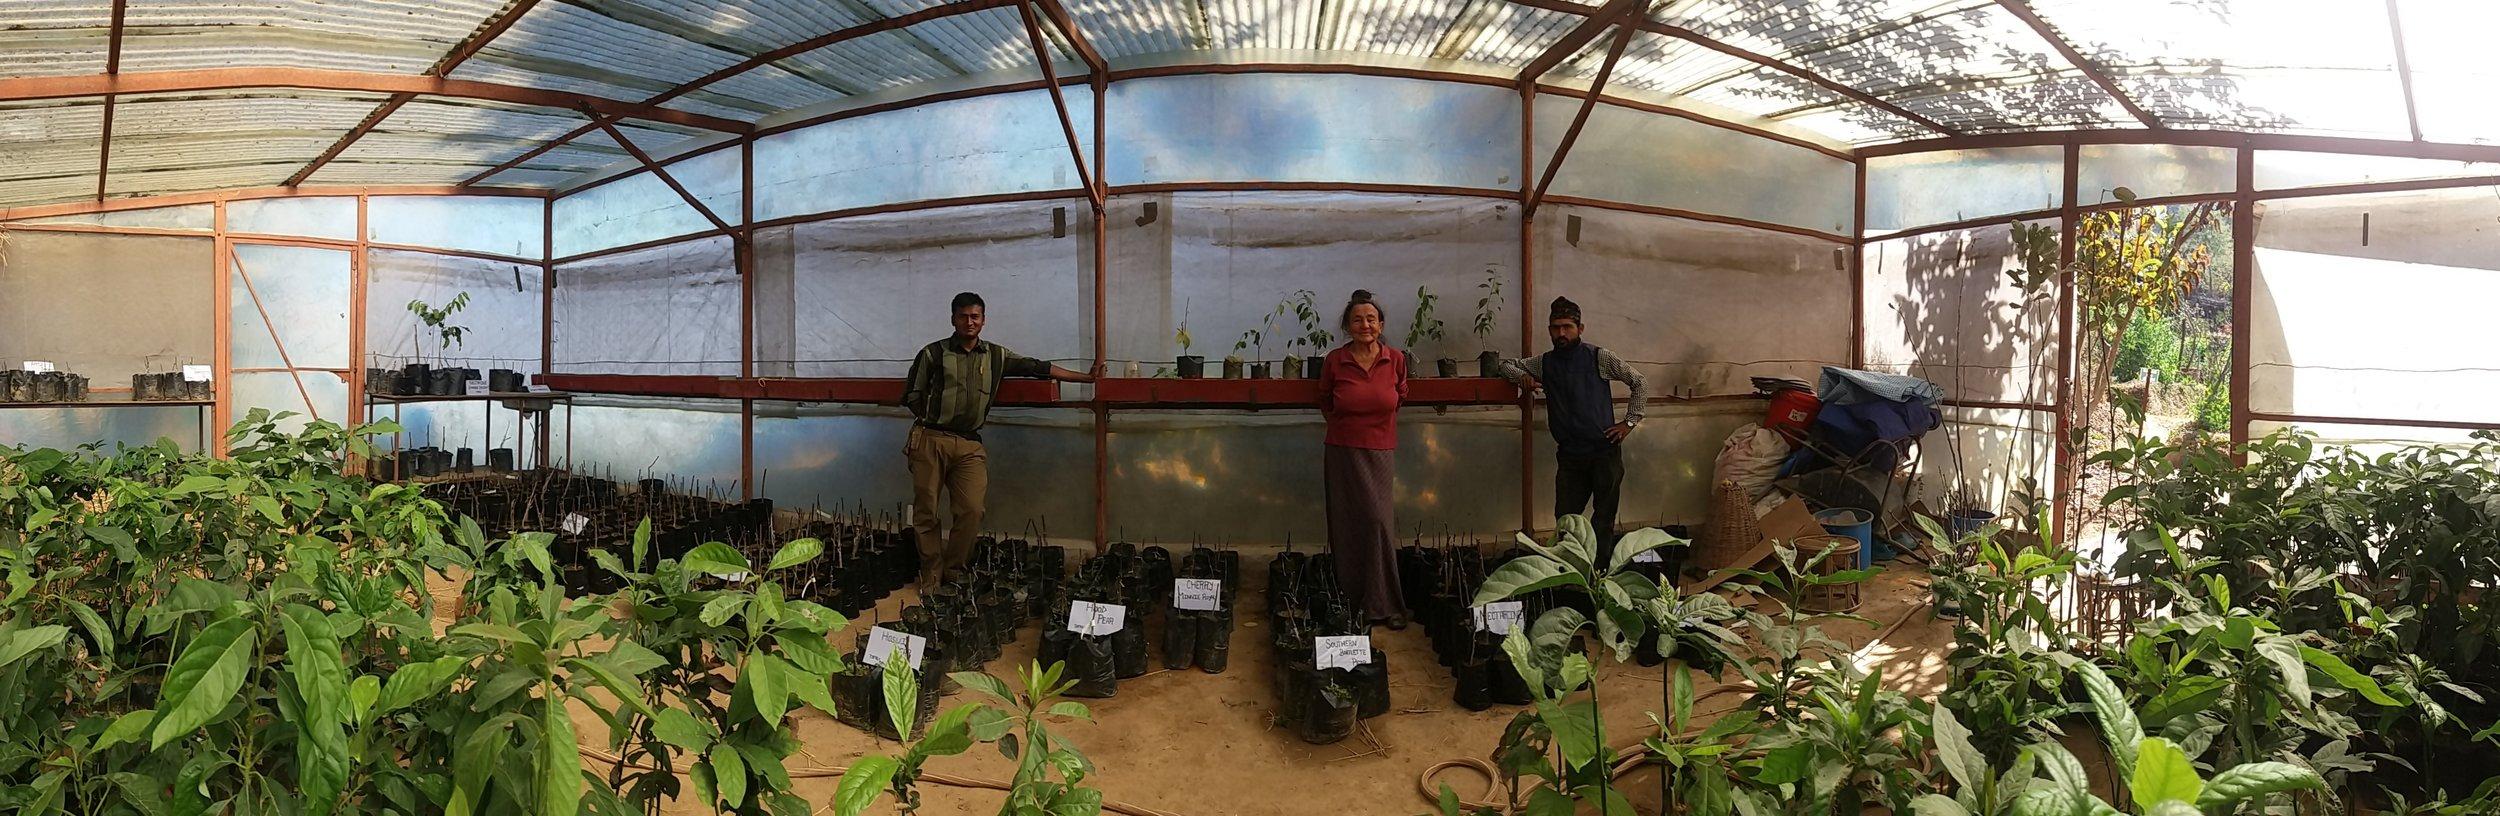 greenhouse pano.jpg